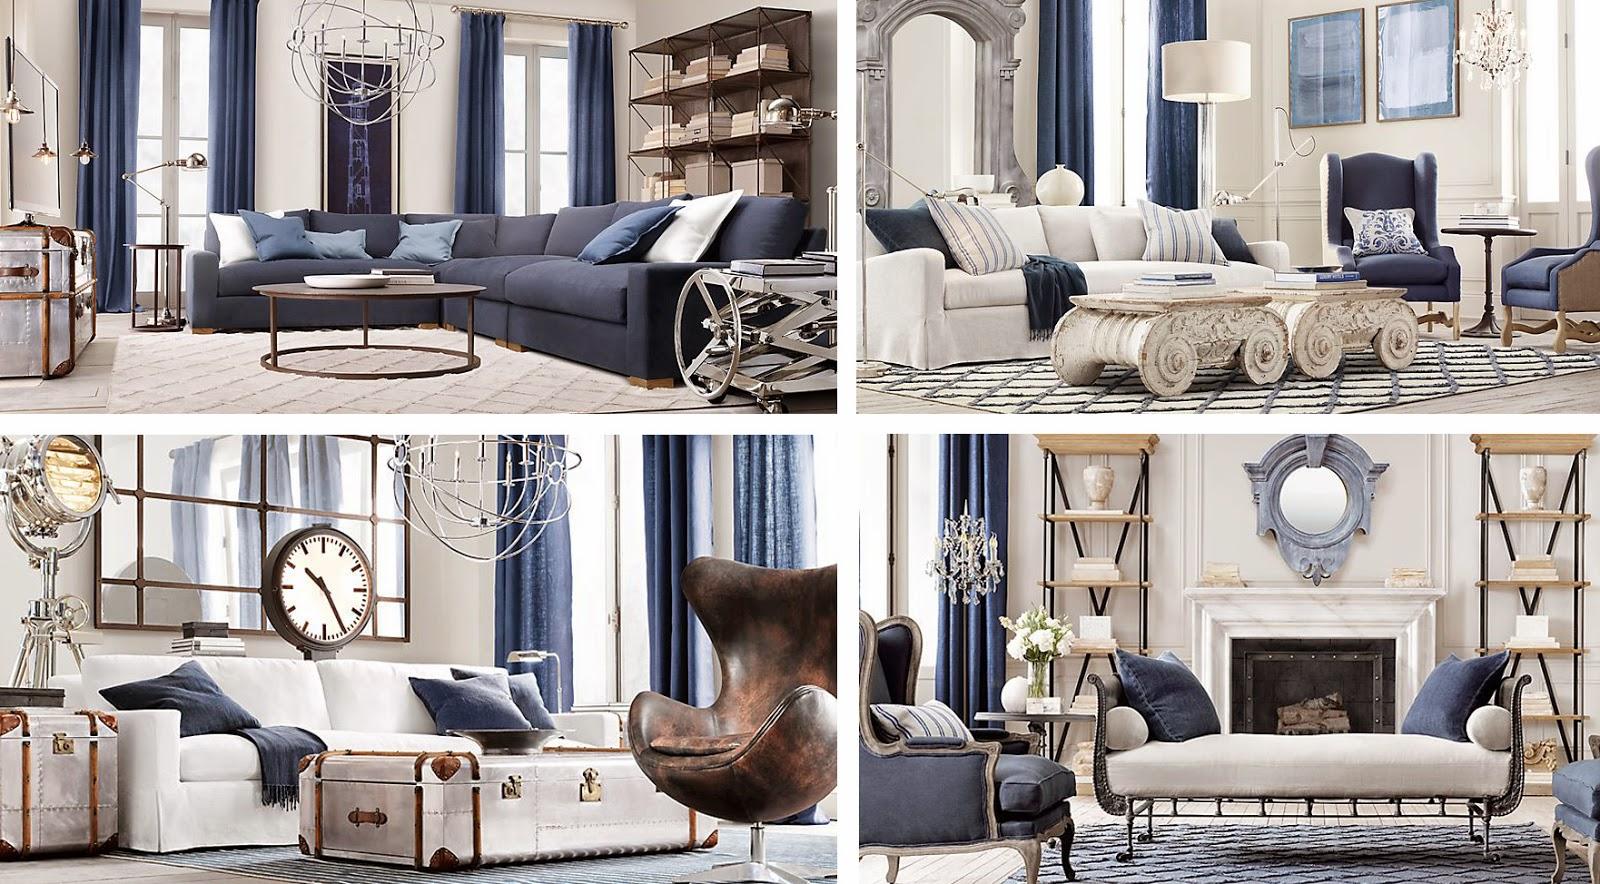 Log Cabin Dining Room Furniture Darya Girina Interior Design Coastal Style In Interior